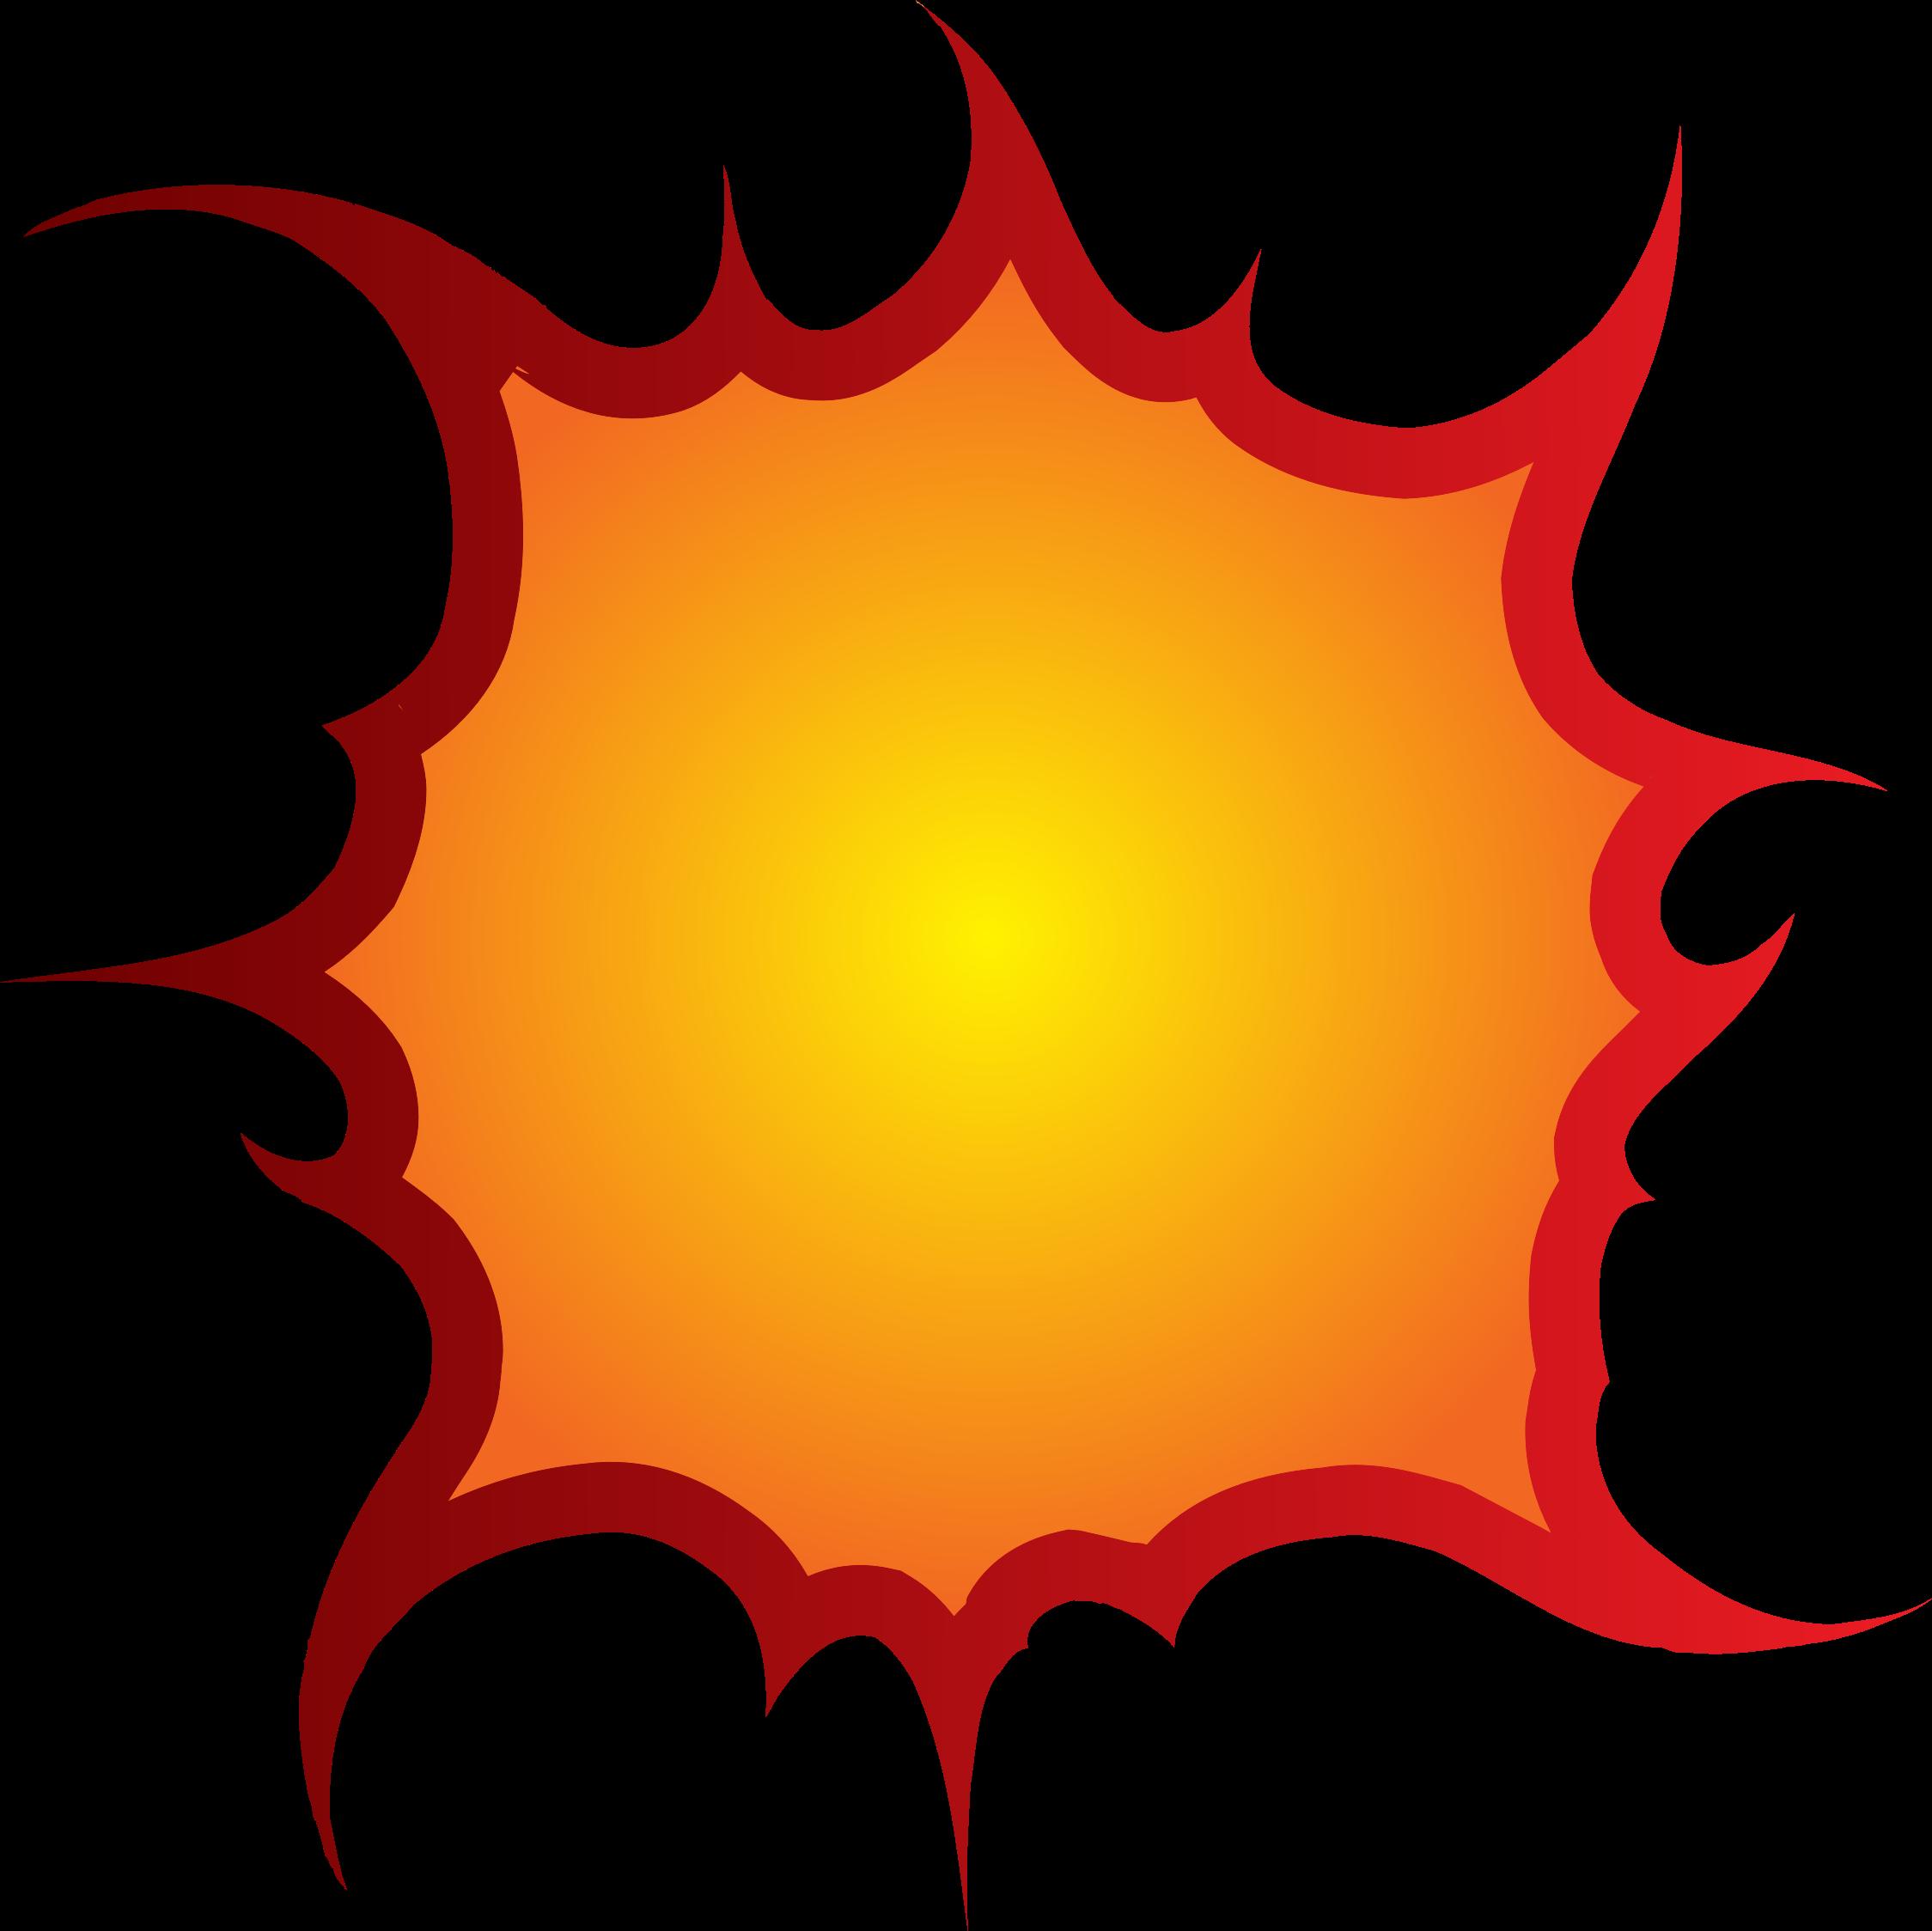 Fireball clipart. Raseone big image png